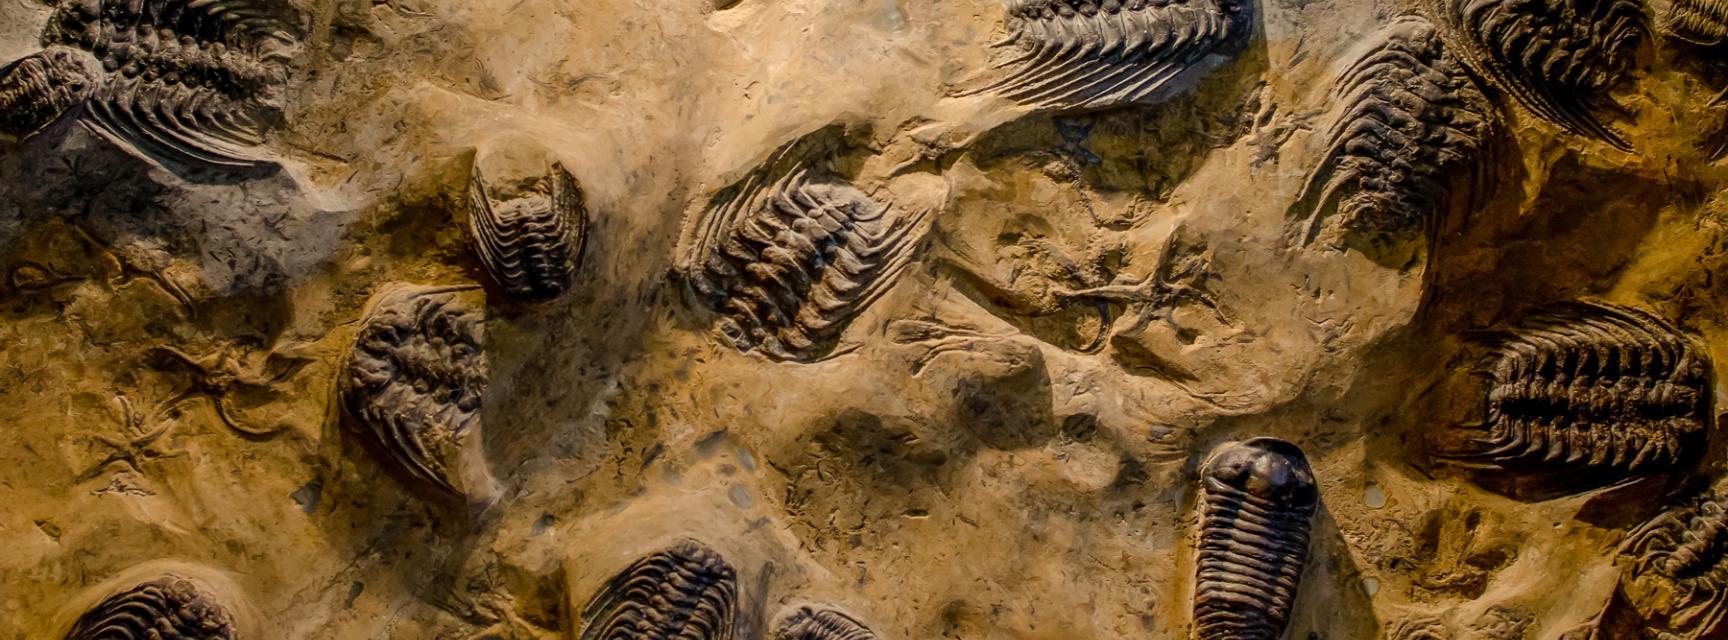 trilobites bannernew